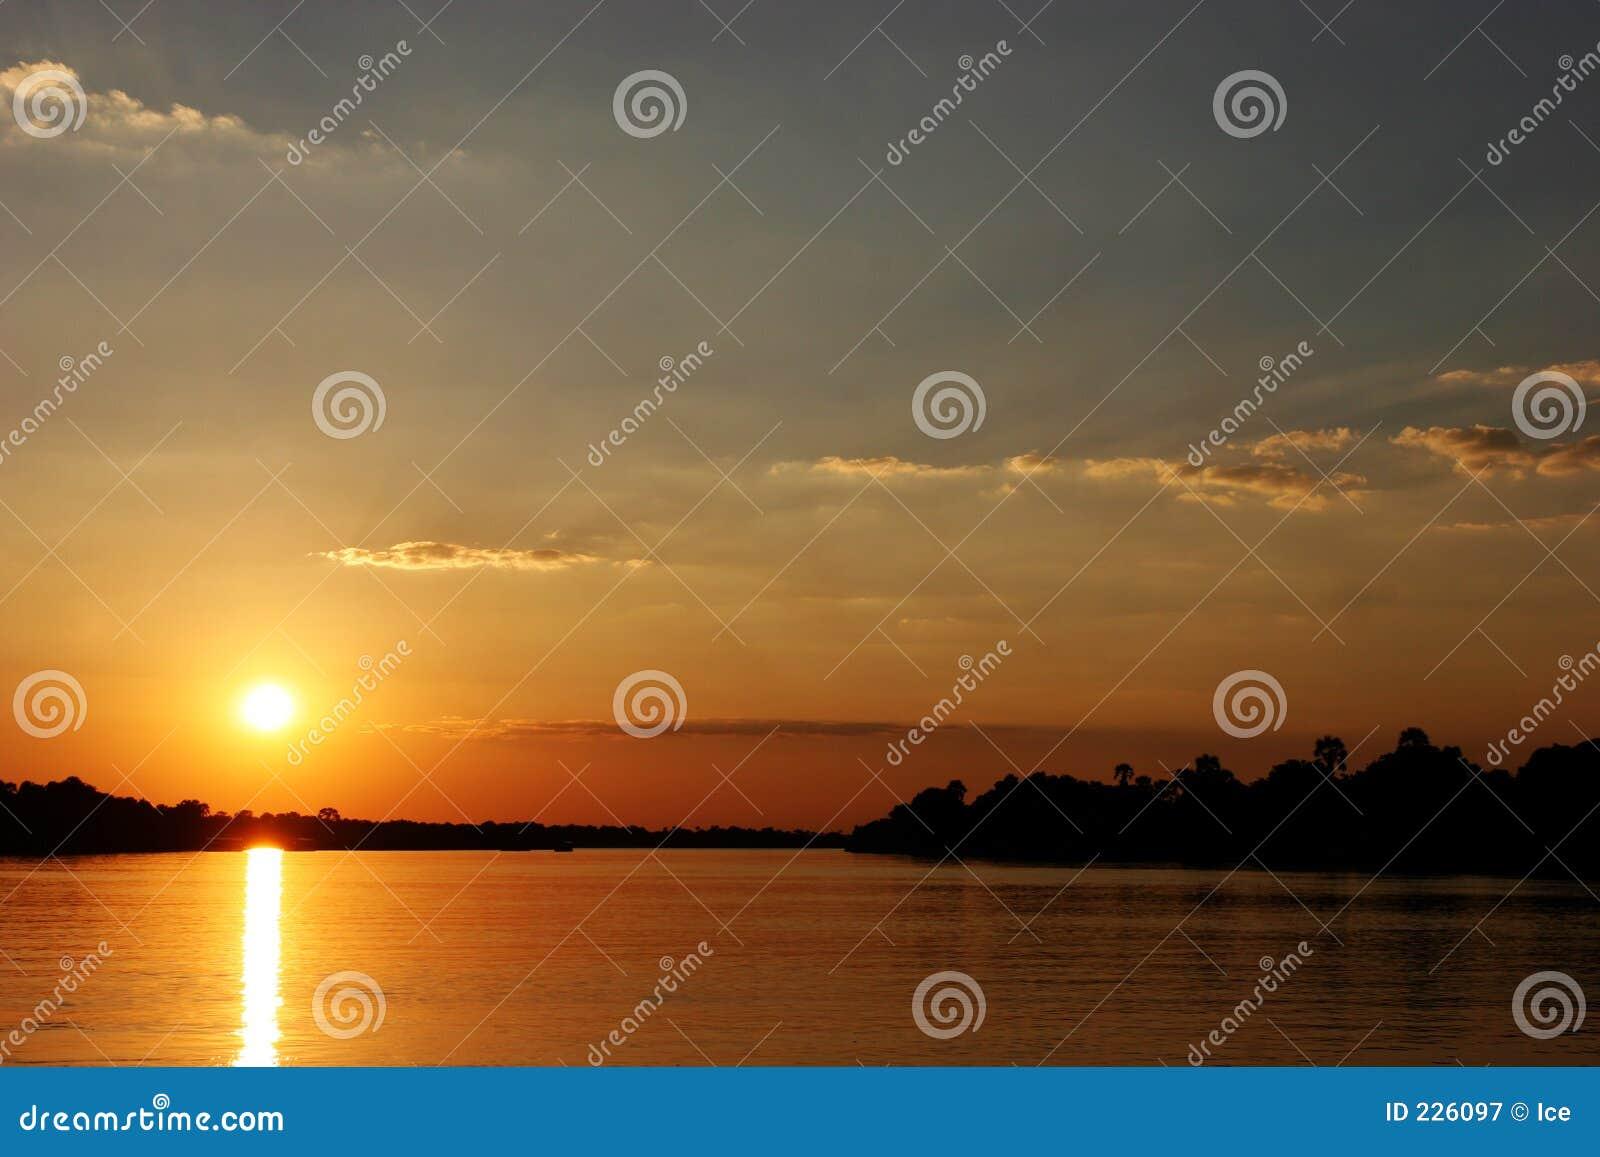 Download Sunset In Zimbabwe Over Zambezi River Stock Image - Image of horizon, outdoor: 226097